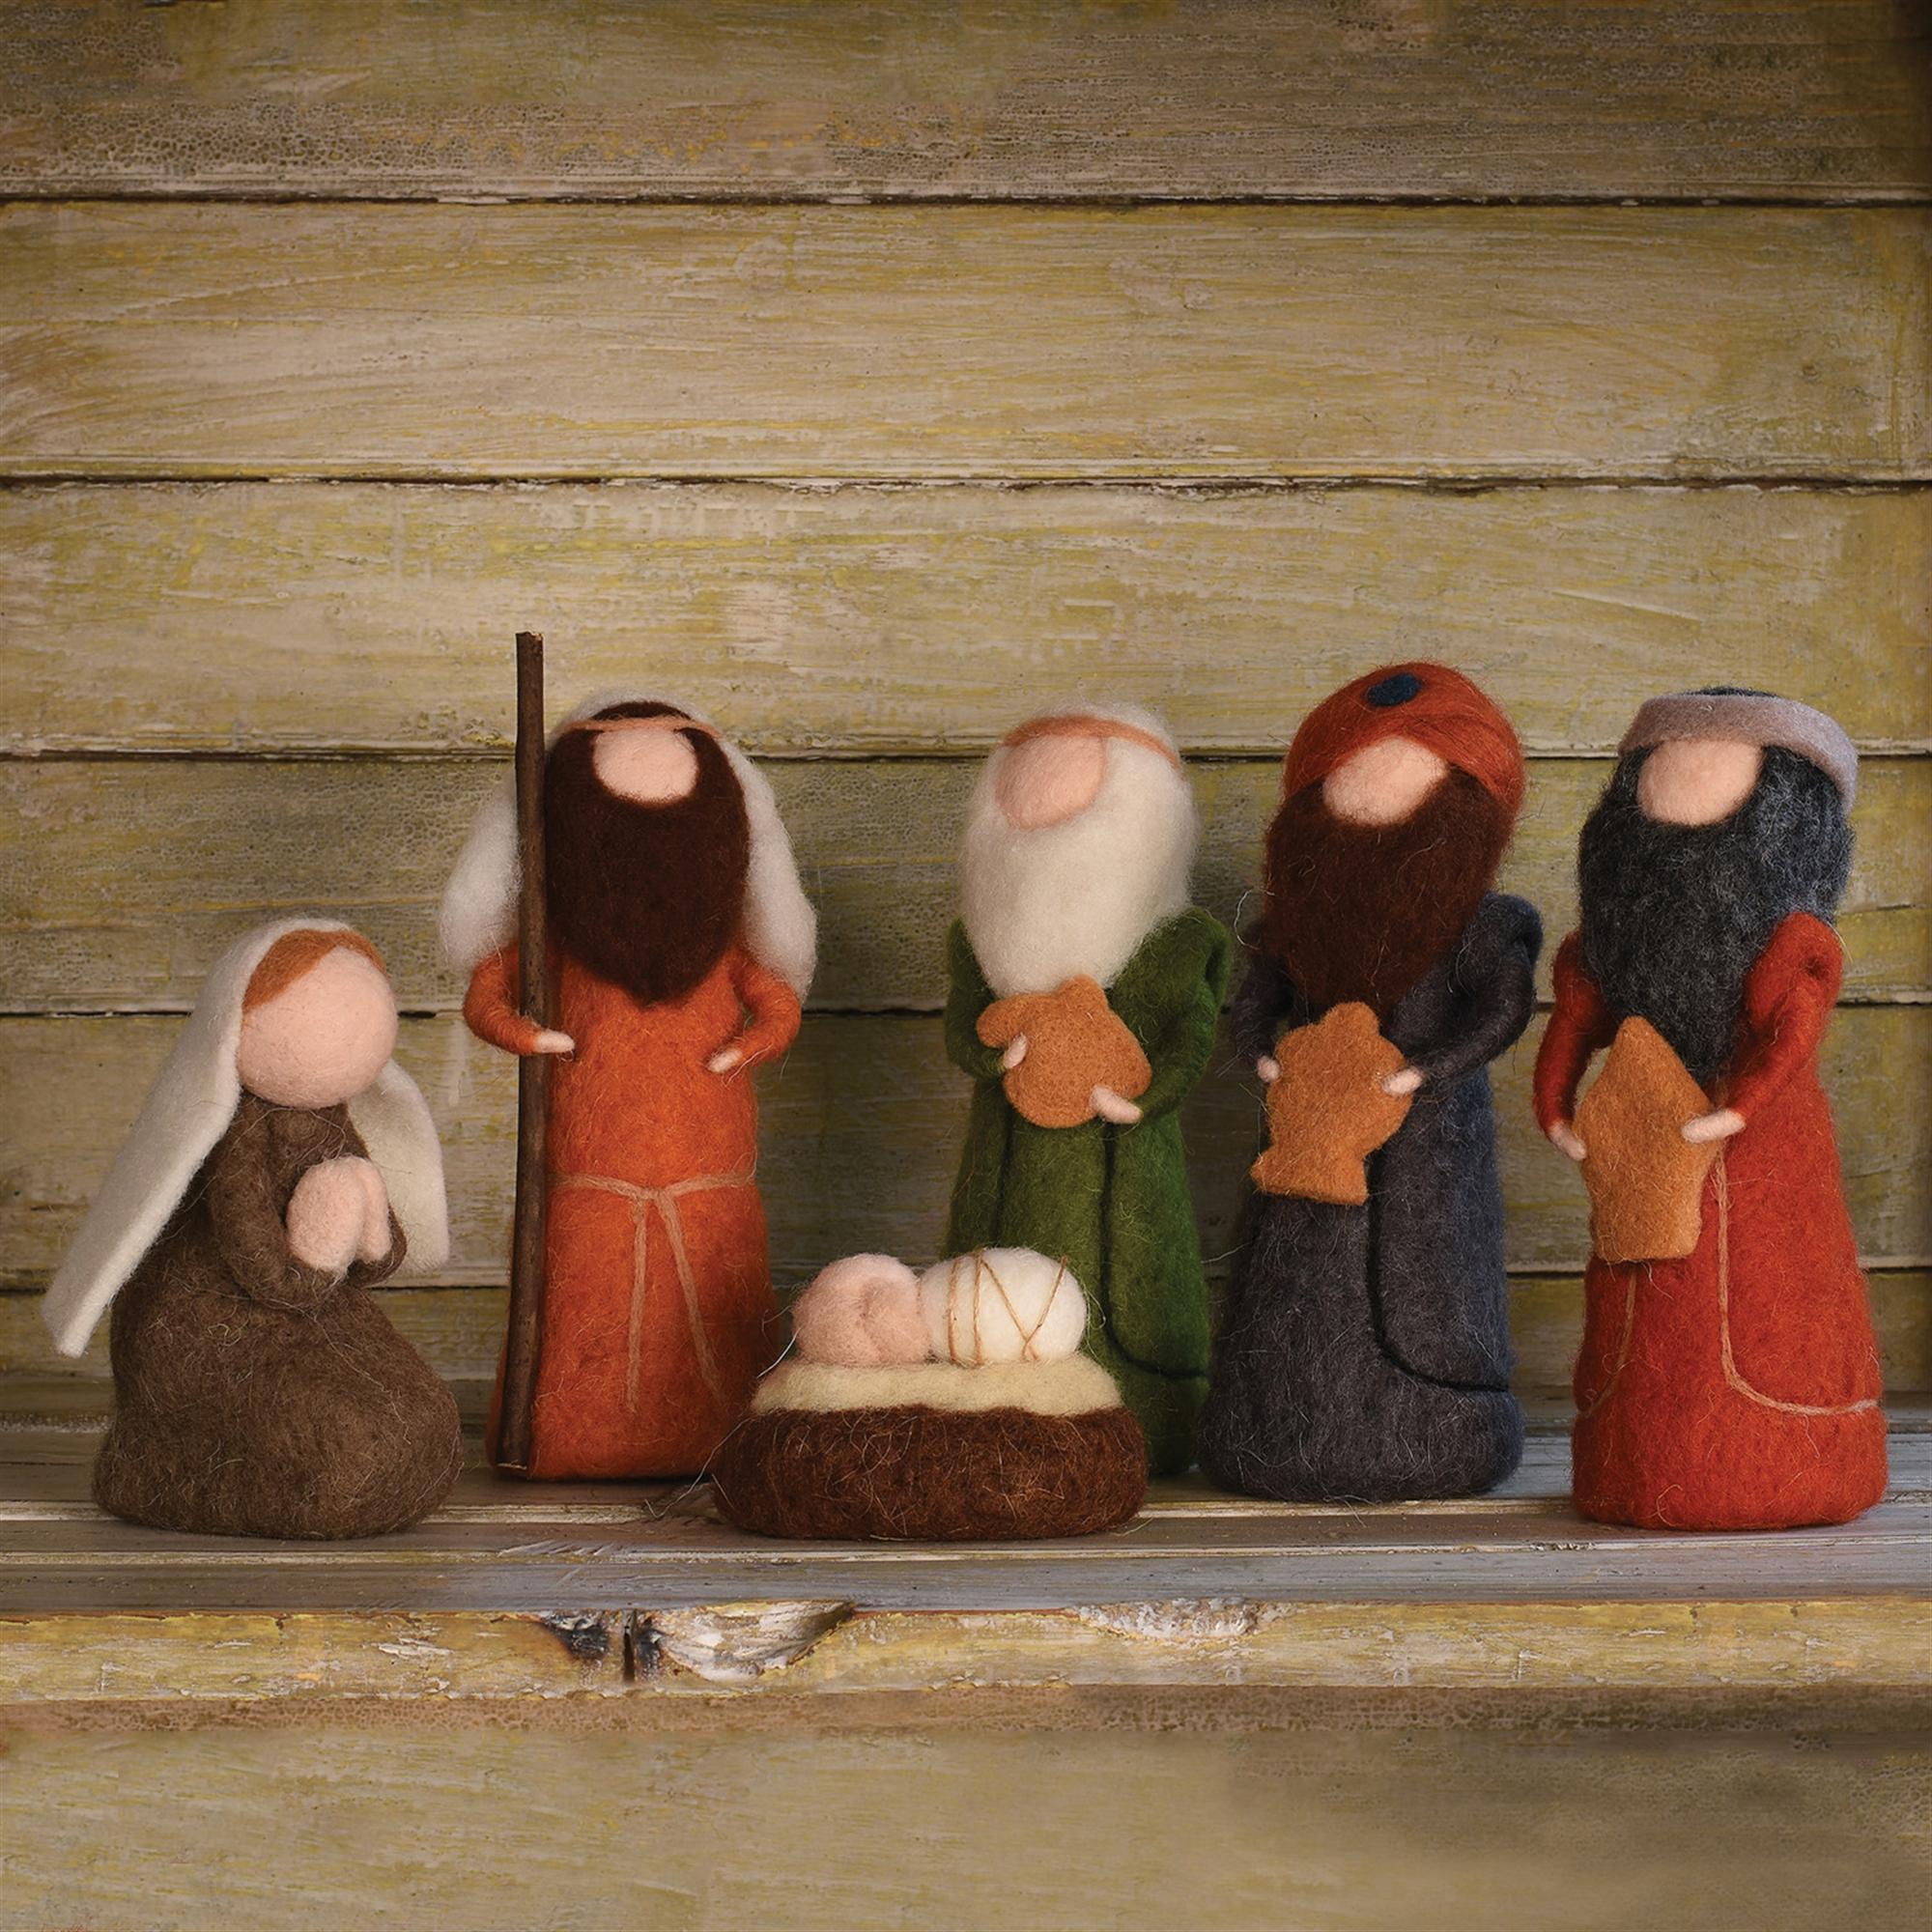 95040-0 - Felt Nativity - Set of 6 Figurines by HomArt